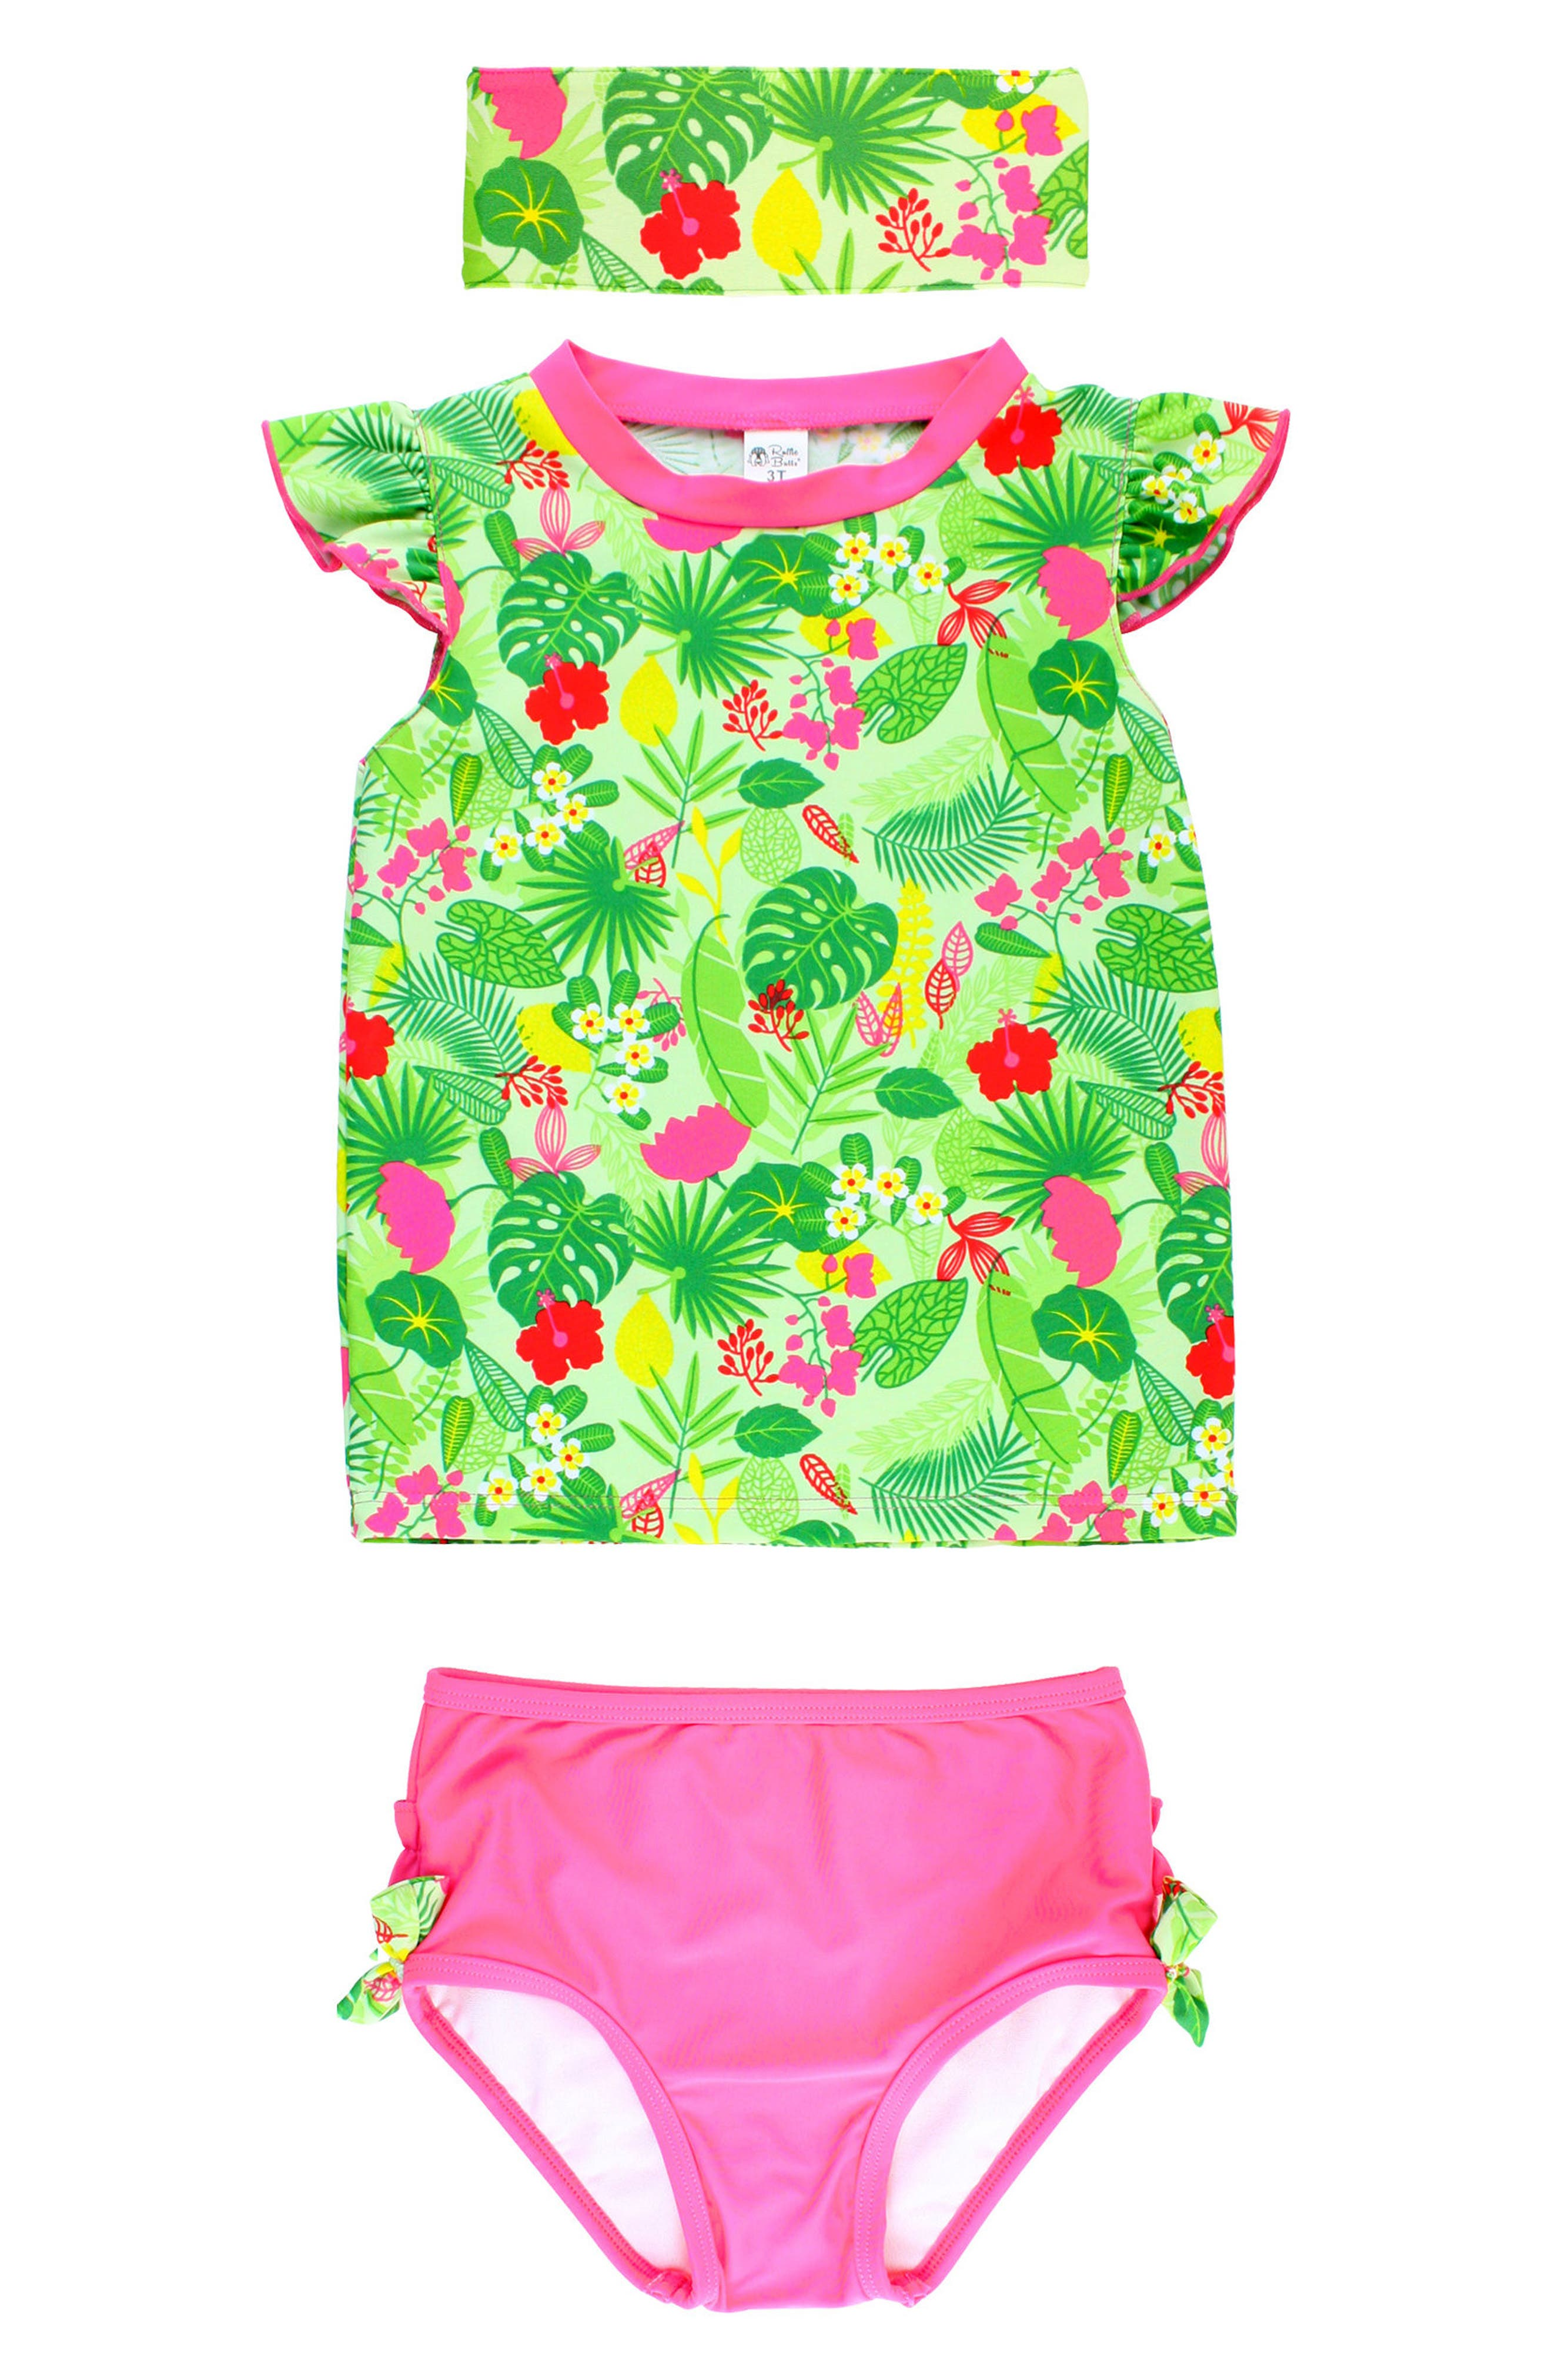 Tropical Two-Piece Rashguard Swimsuit & Headband Set,                             Main thumbnail 1, color,                             320